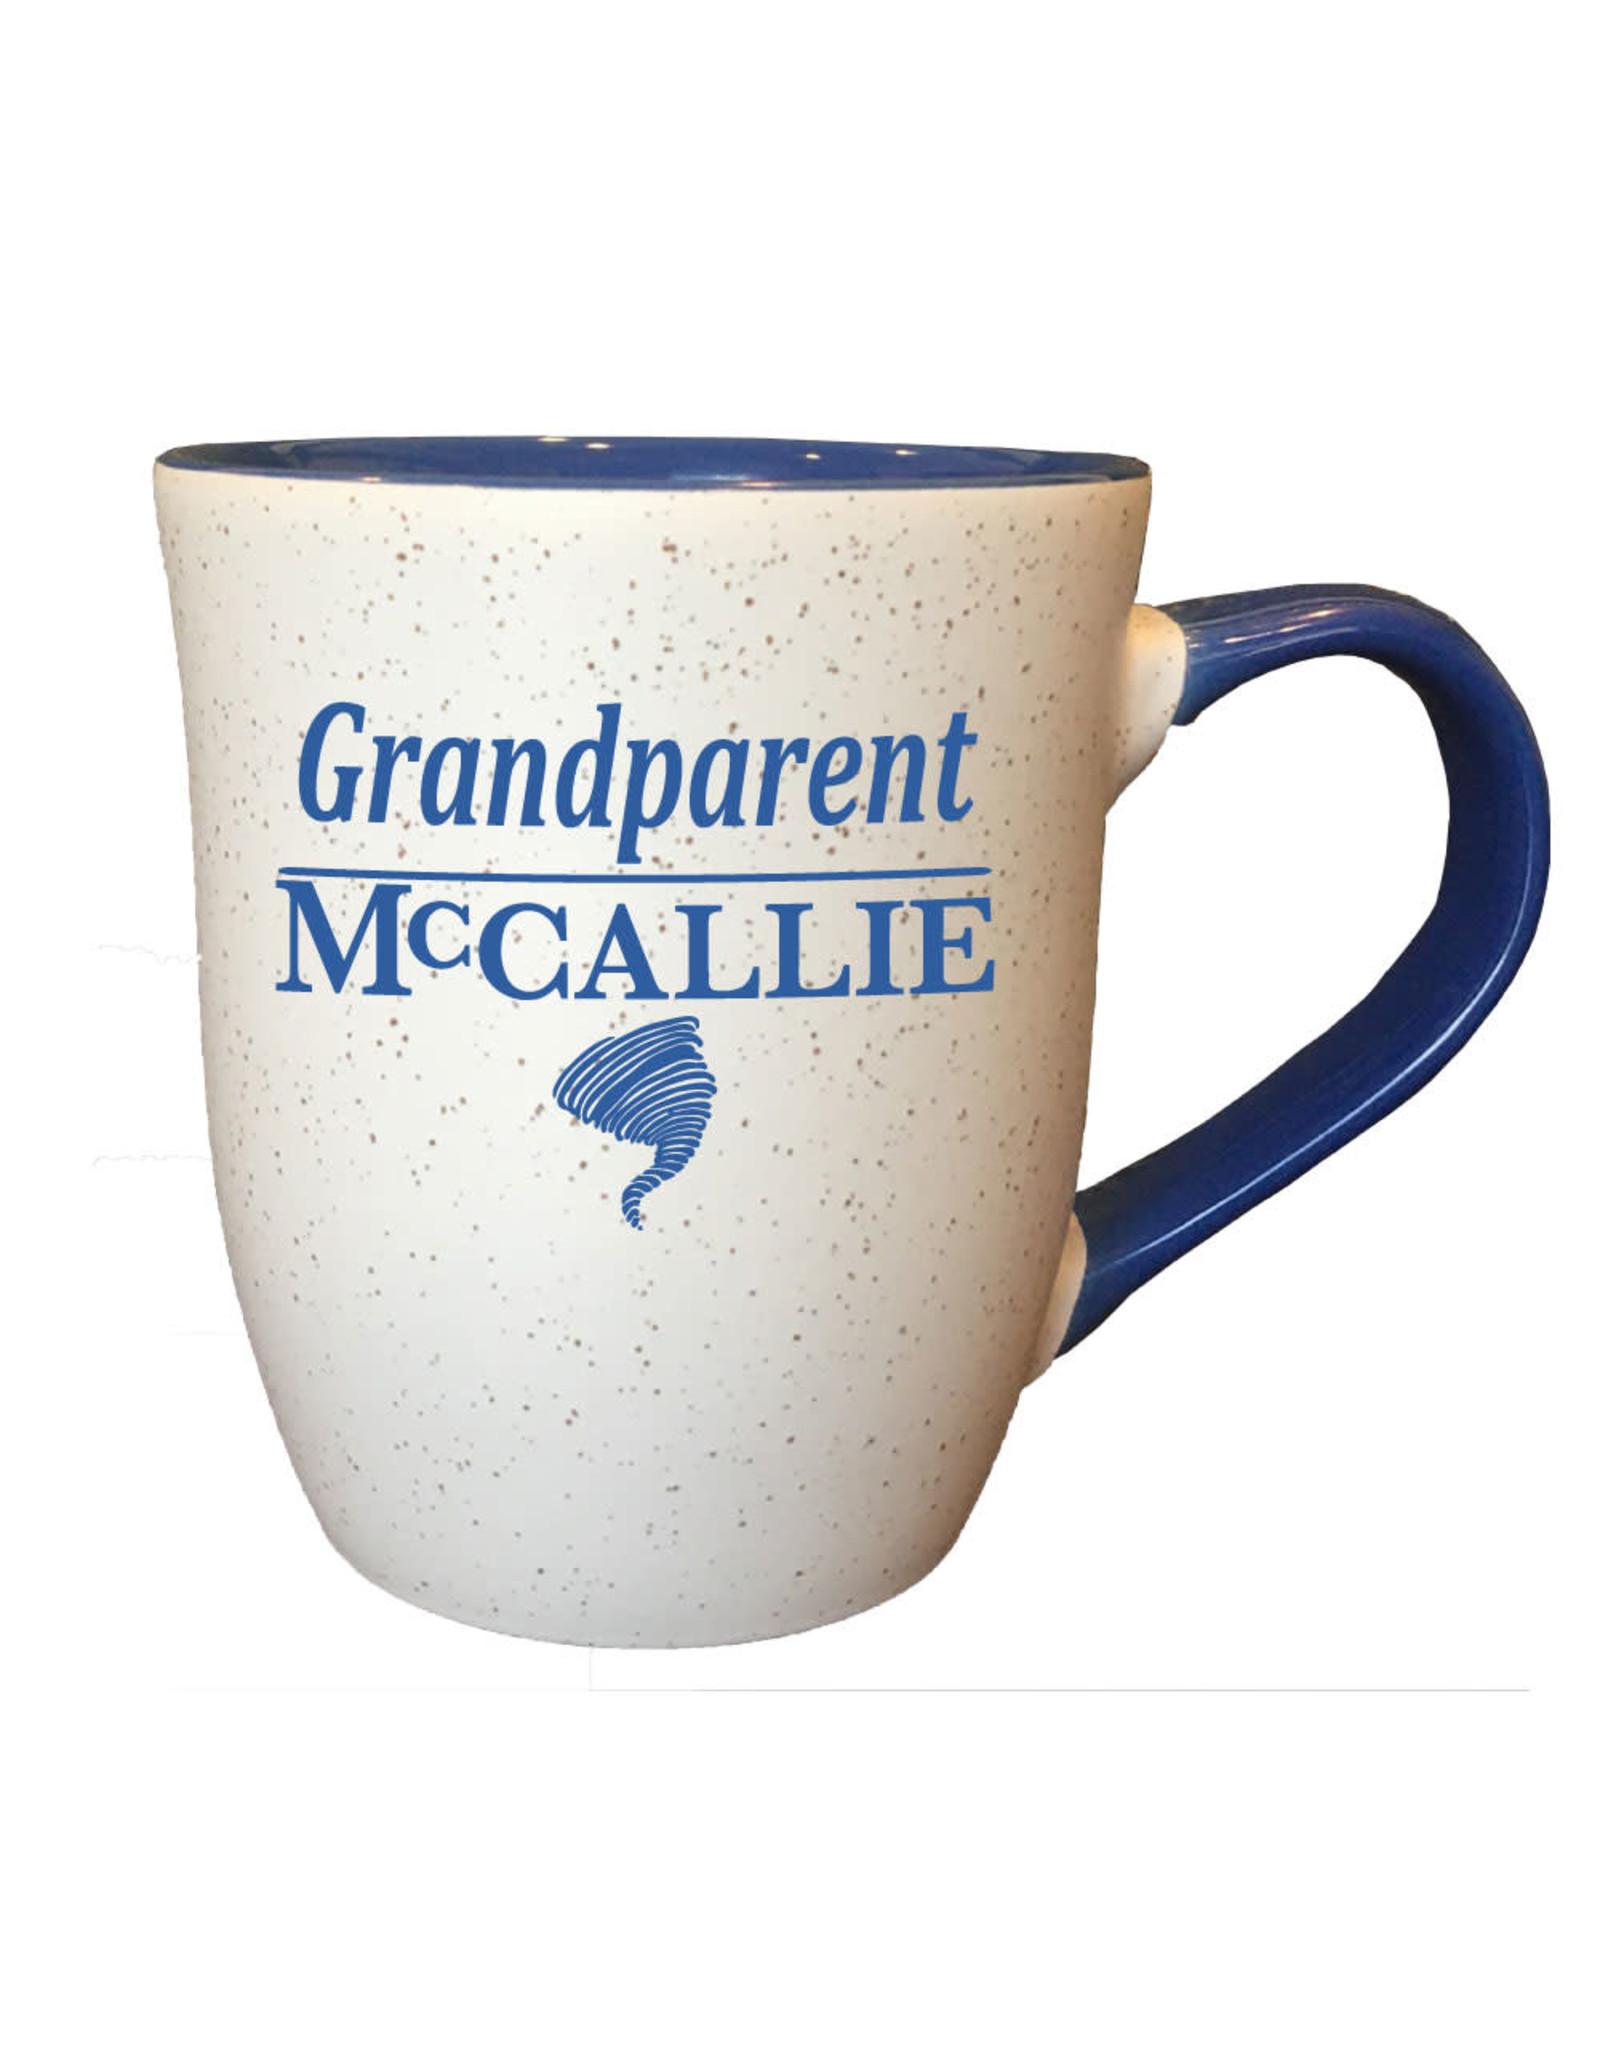 MCCALLIE GRANDPARENT MUG